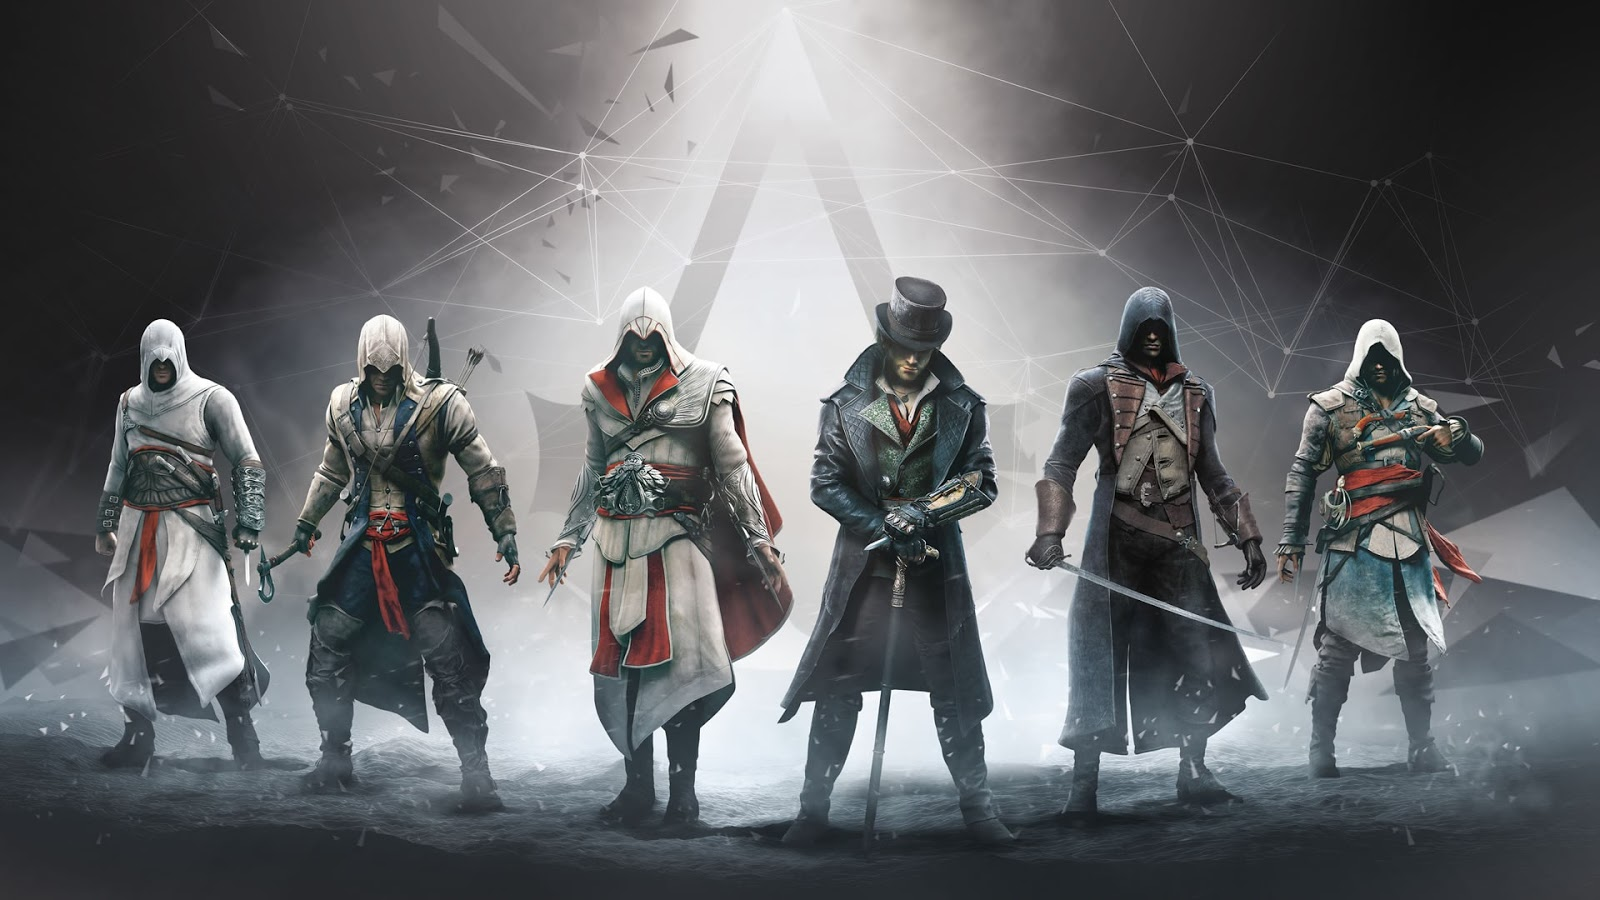 Beautiful Assassin's Creed Wallpaper